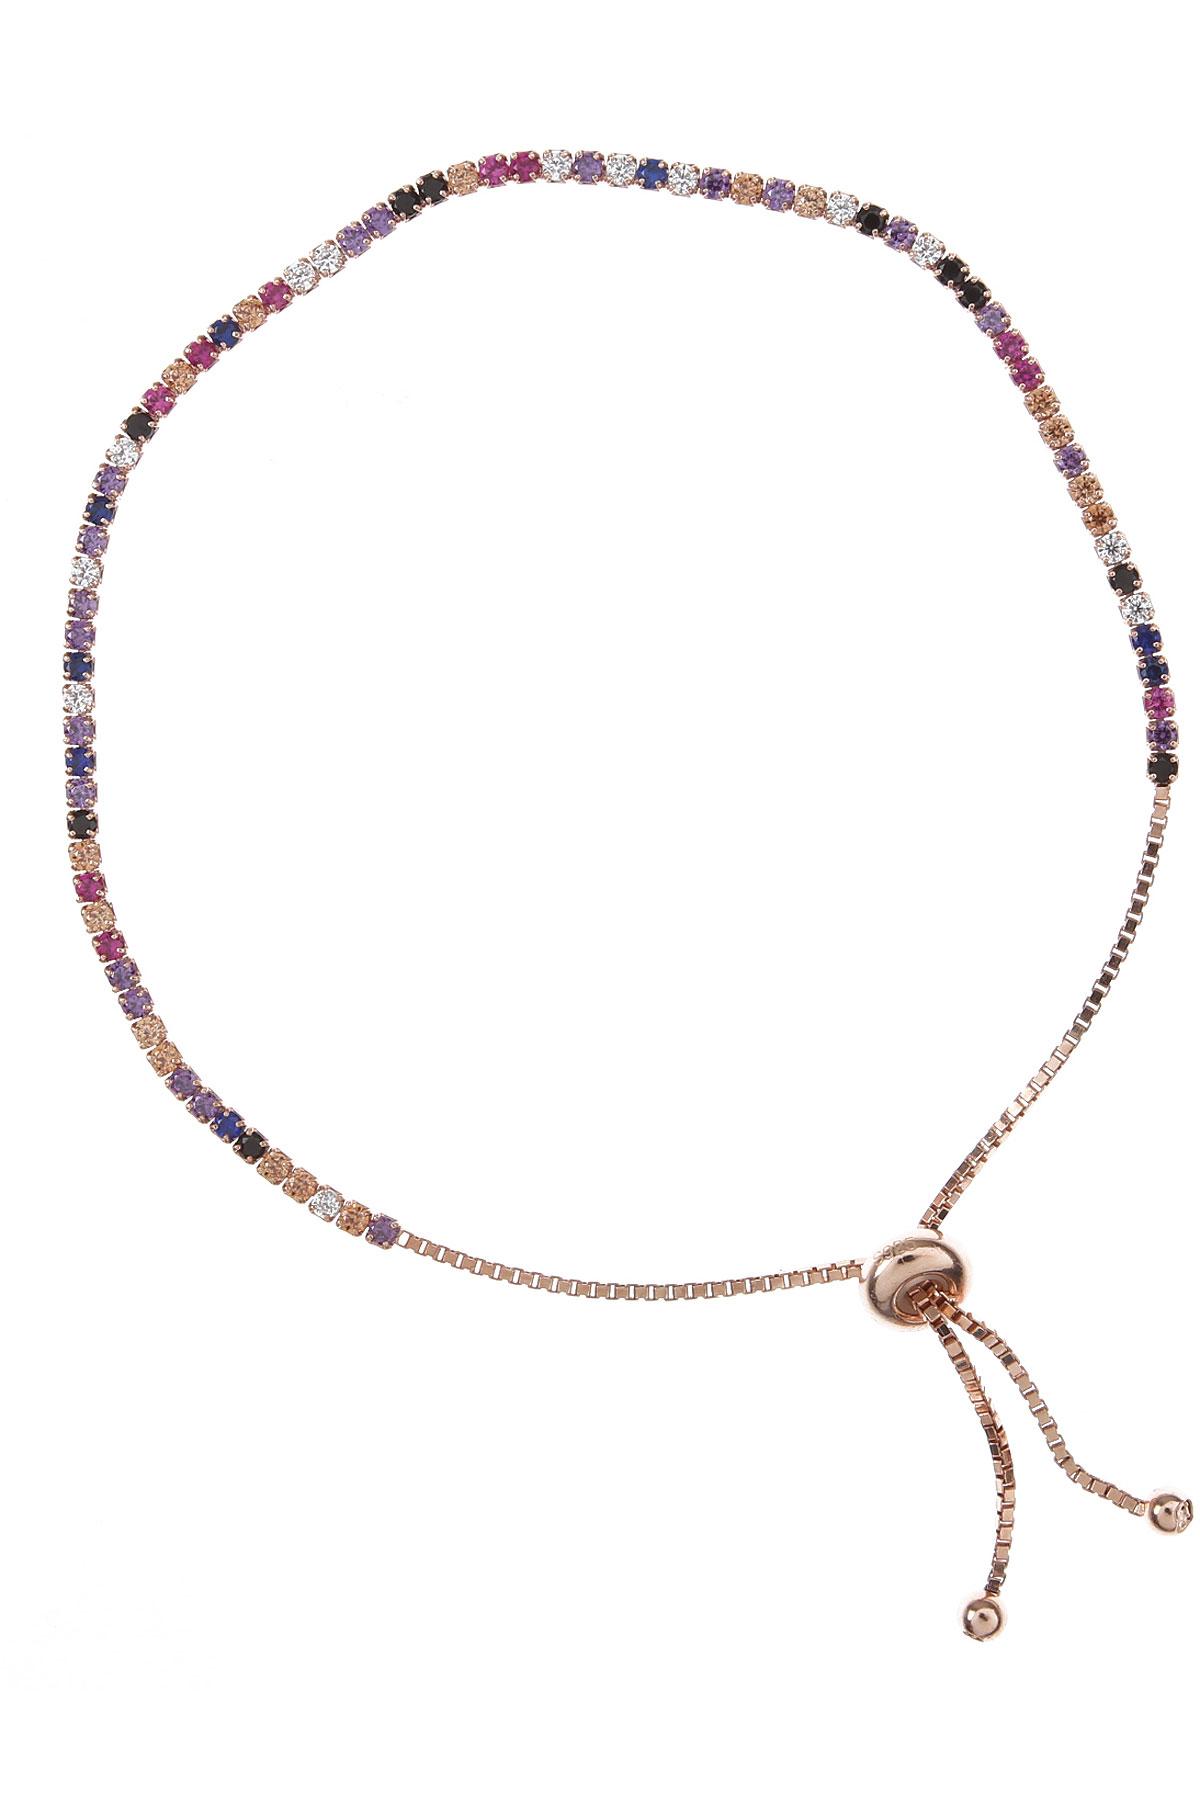 Francesca Angelone Bracelet for Women On Sale, Gold Pink, Silver 925, 2019